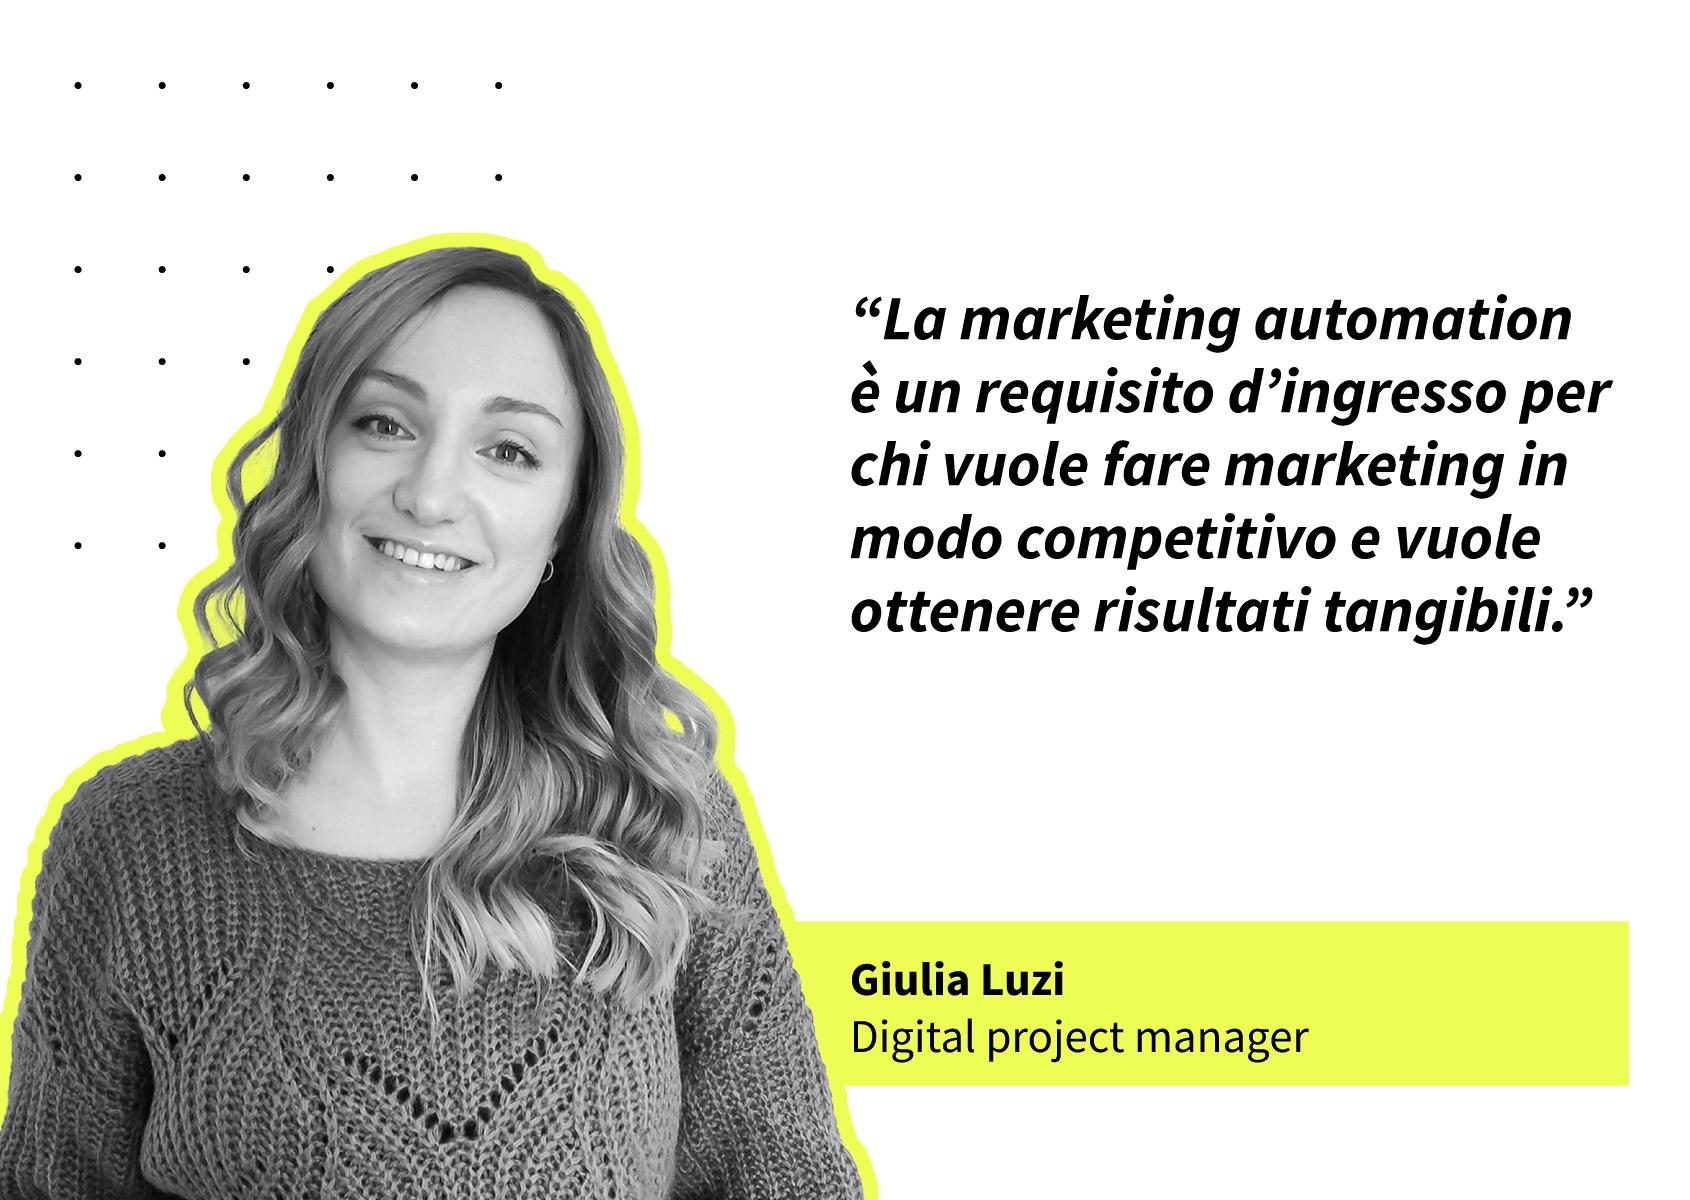 Marketing-automation-2021-quote-Giulia